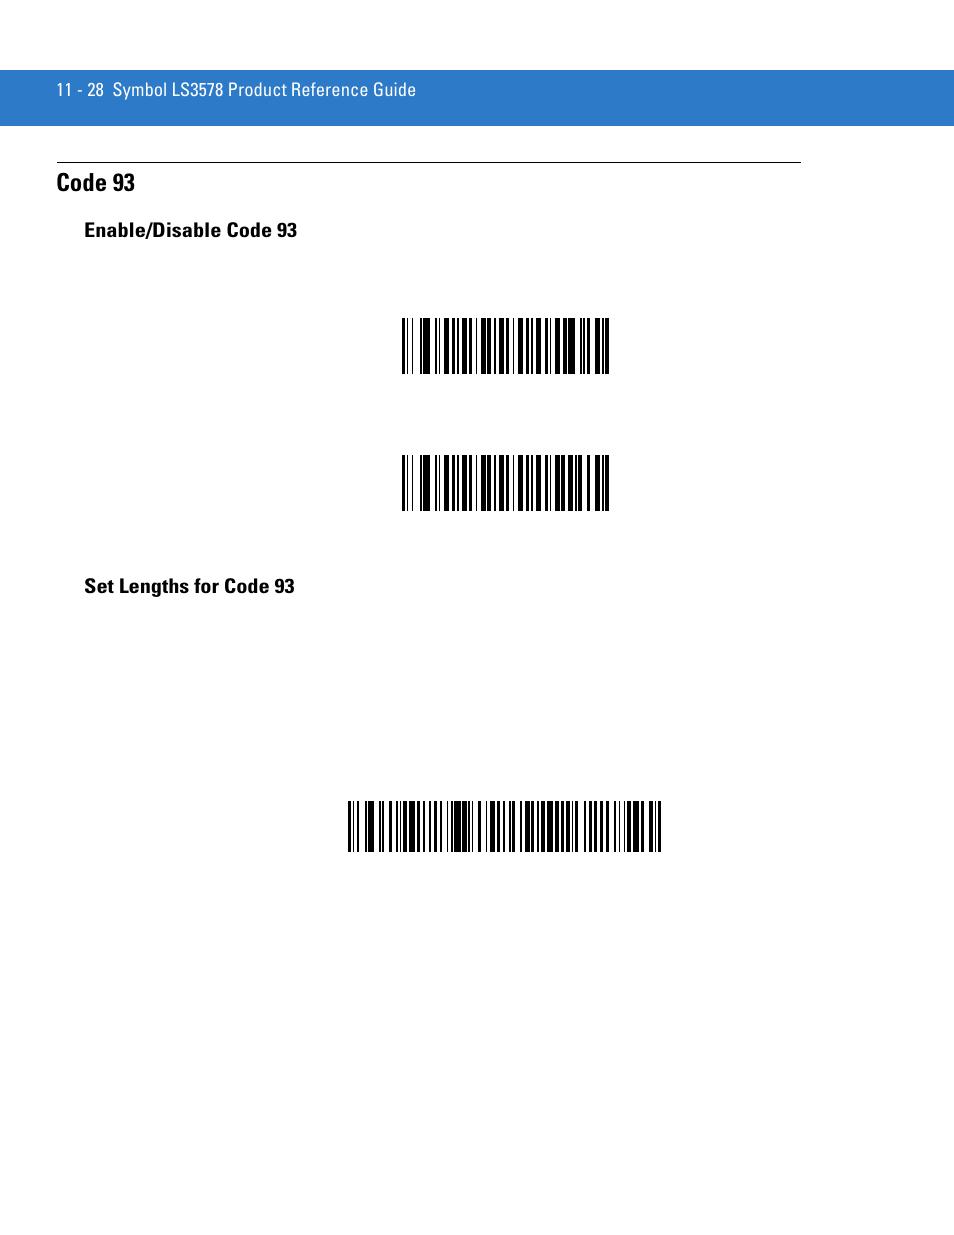 Code 93 Enabledisable Code 93 Set Lengths For Code 93 Motorola